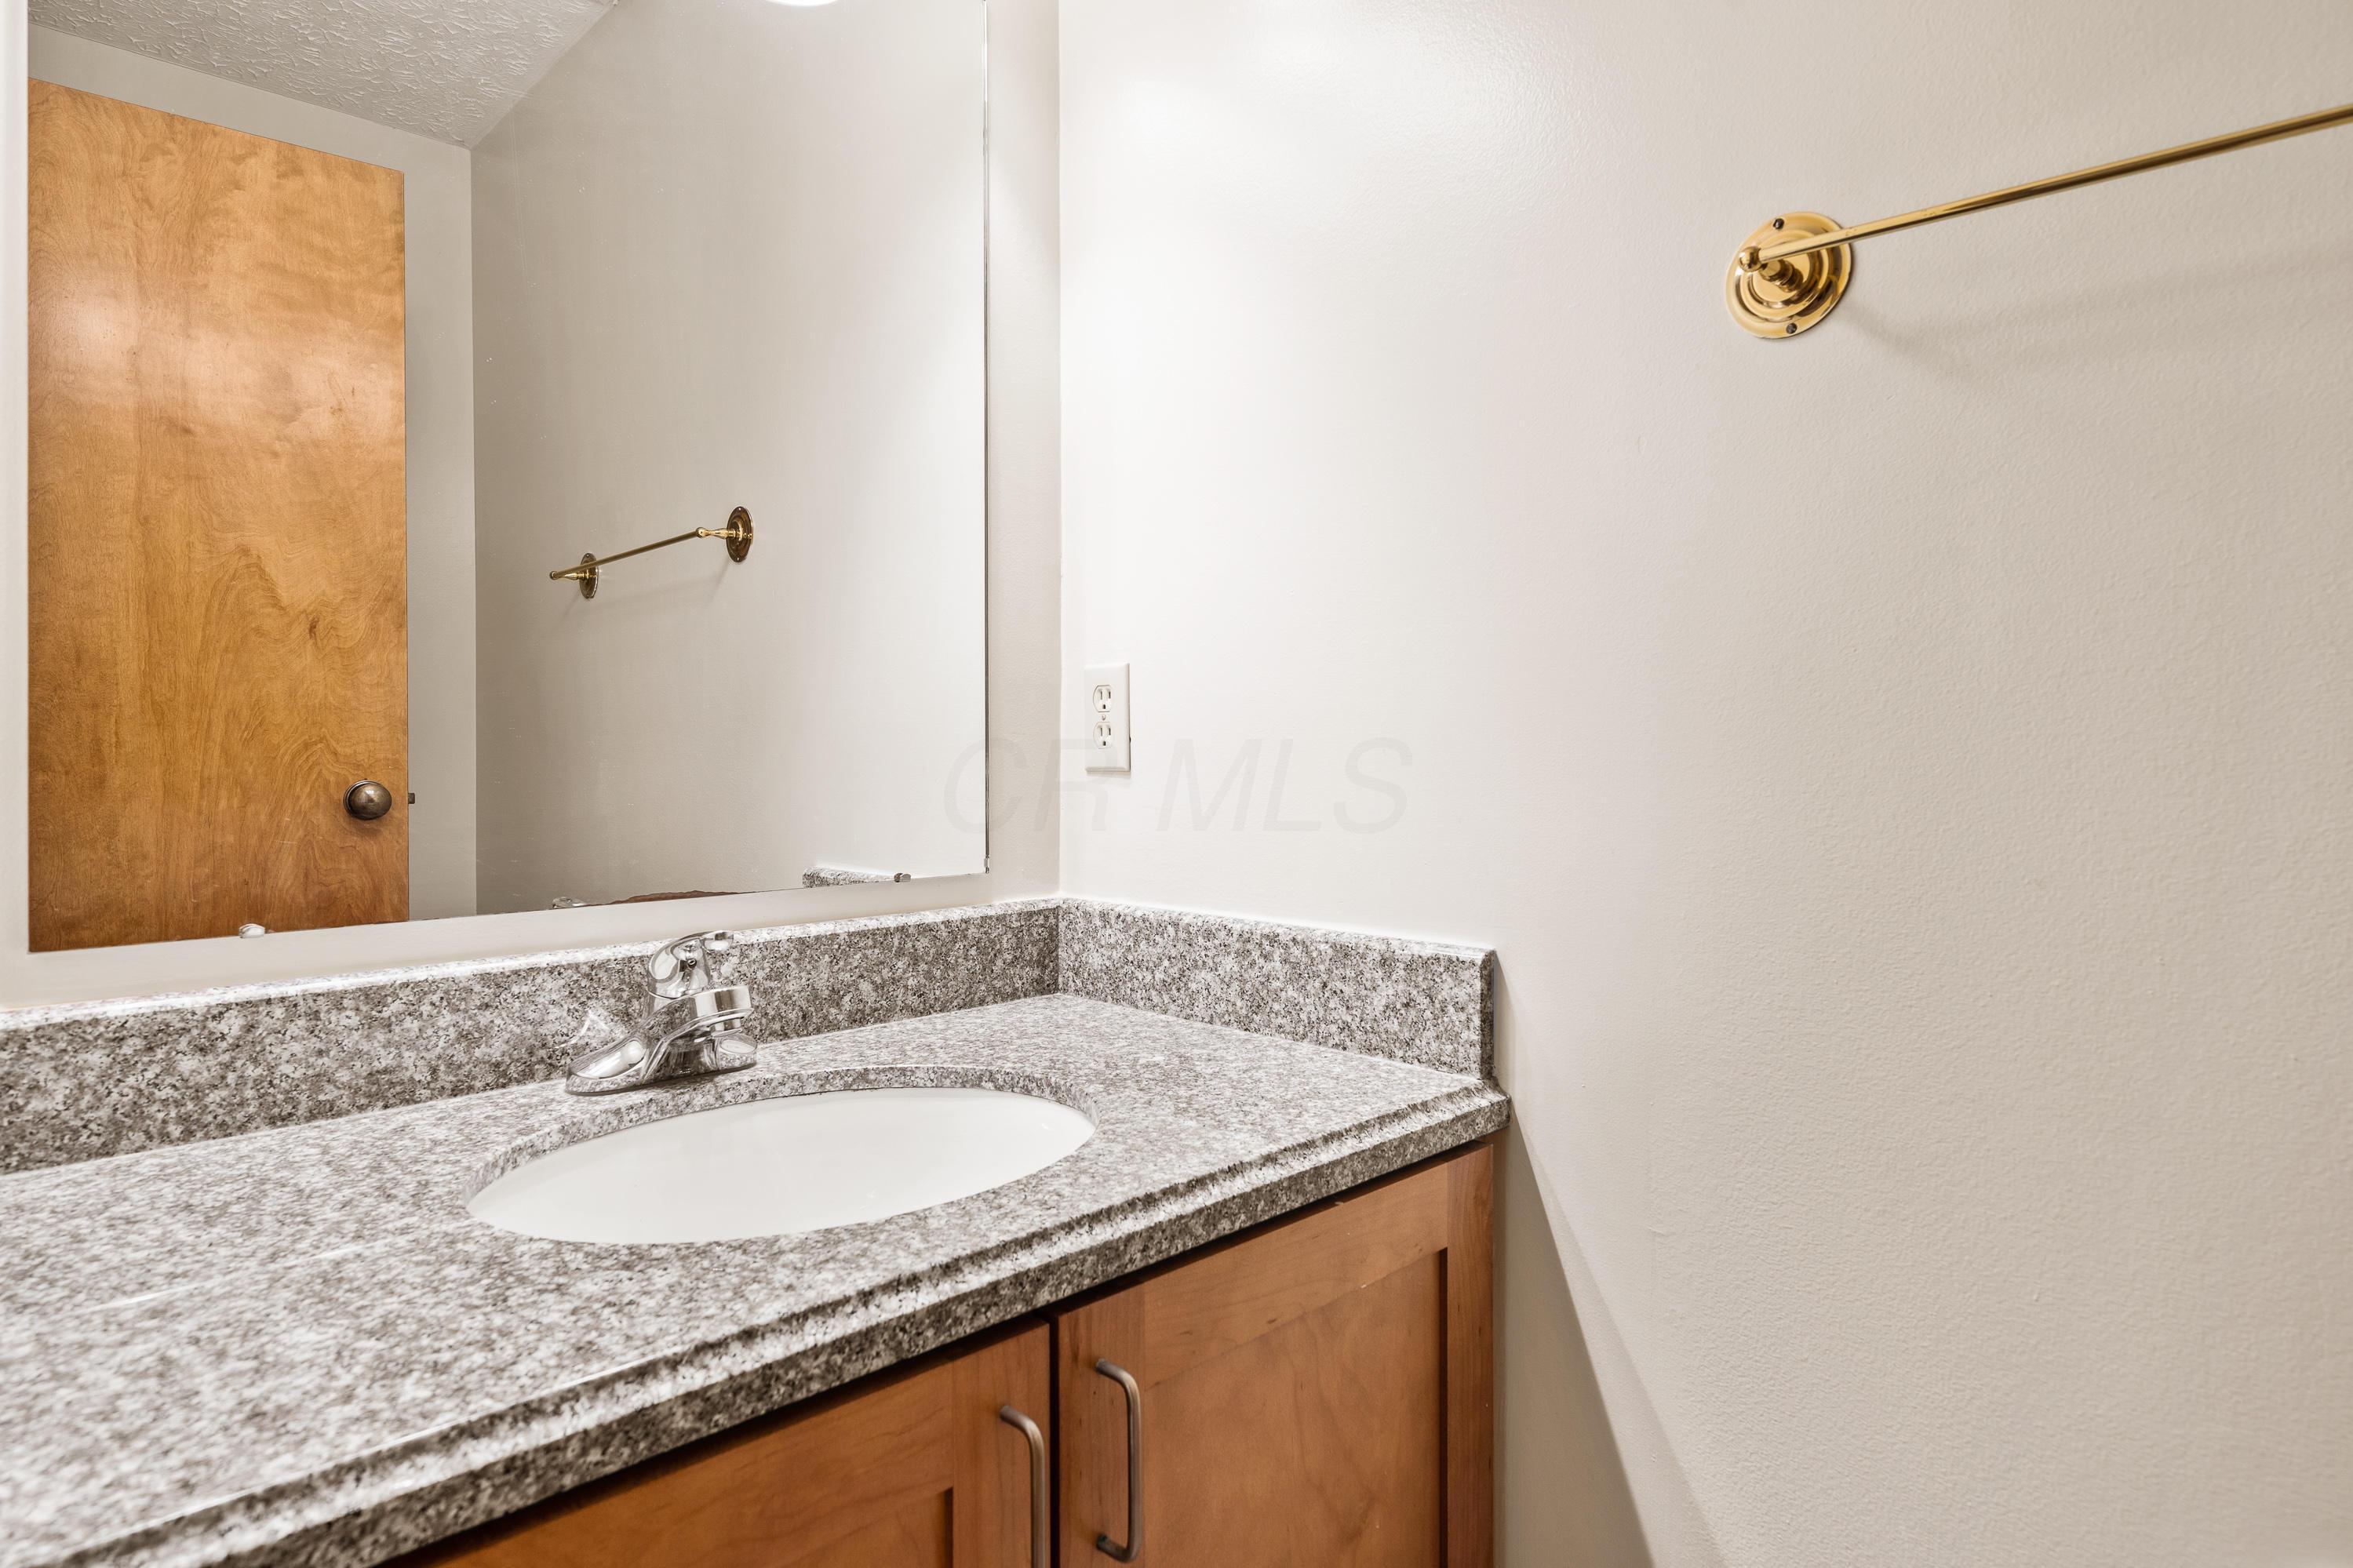 3797 Greenbridge Loop, Dublin, Ohio 43016, 2 Bedrooms Bedrooms, ,2 BathroomsBathrooms,Residential,For Sale,Greenbridge,220037782